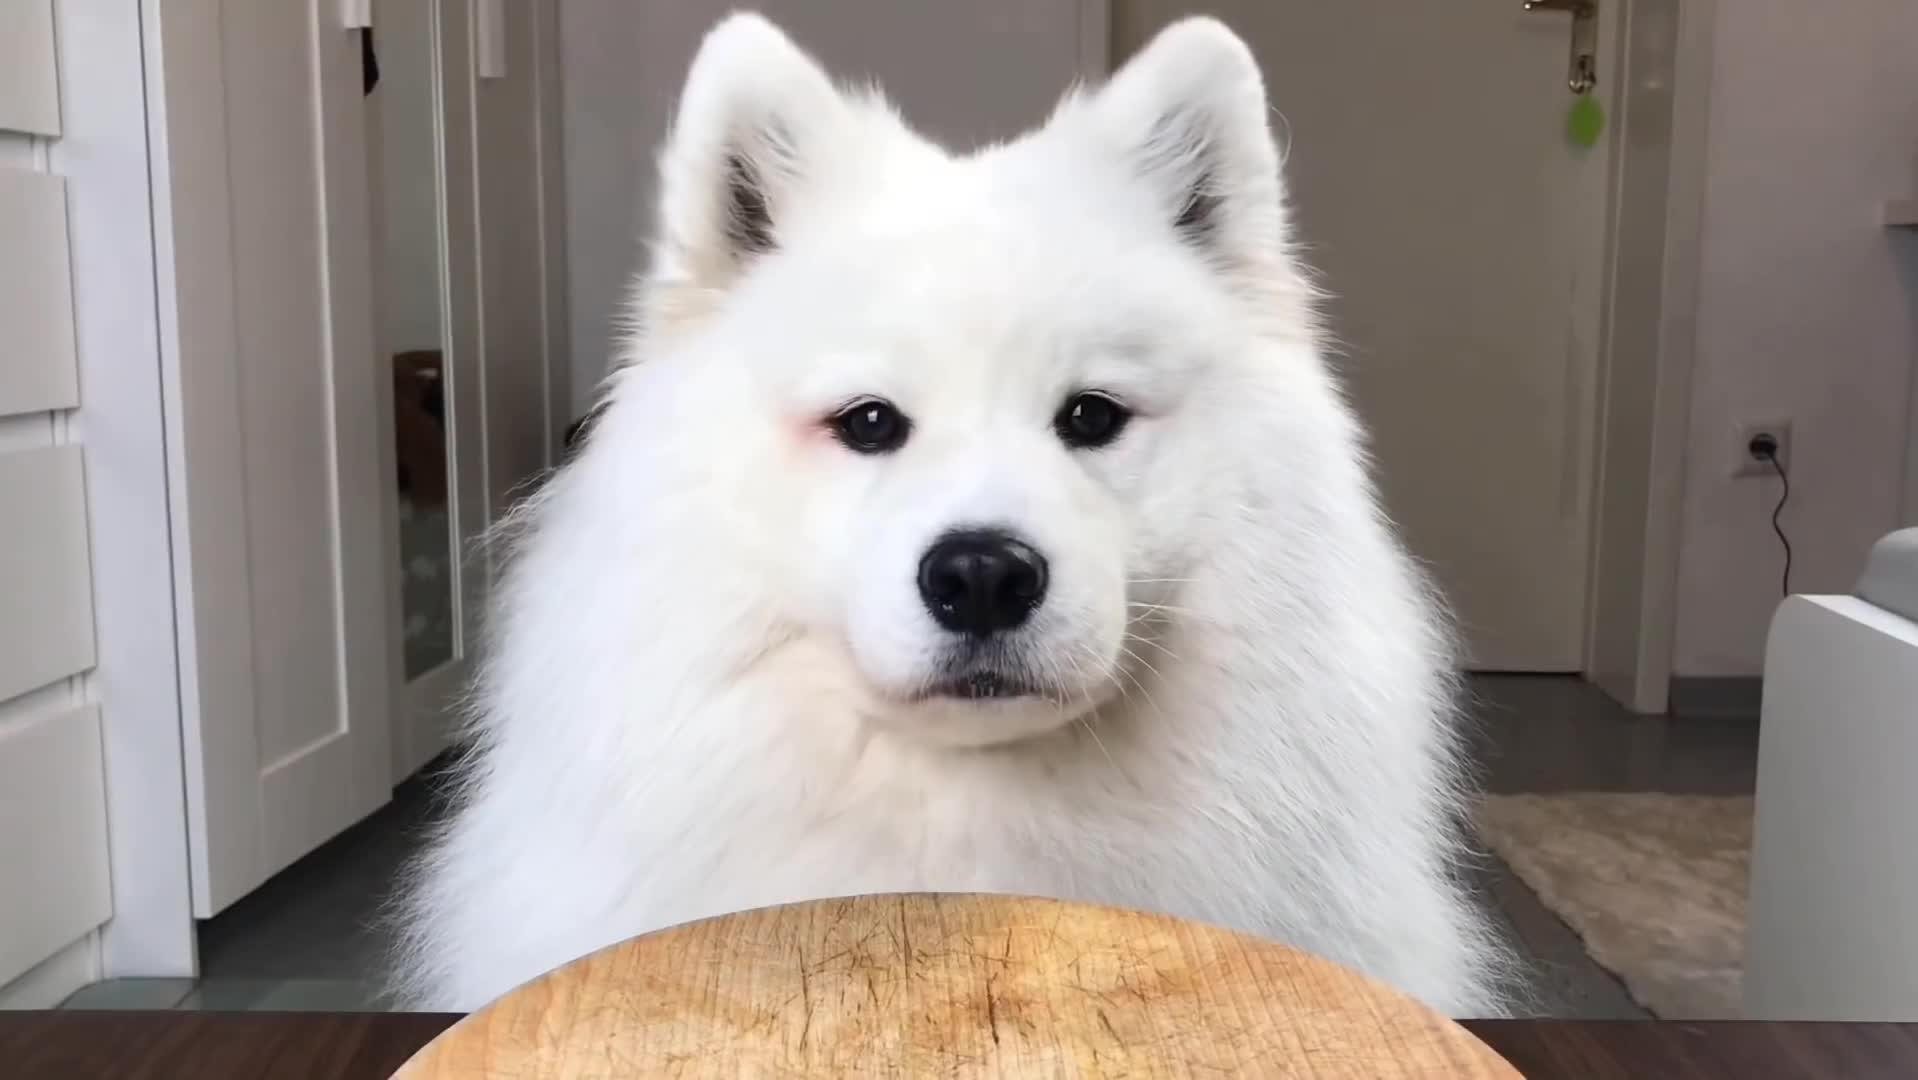 Maya, Maya samoyed, Mayapolarbear, animal, cute, cute dog, dog, funny, pet, samoyed, ASMR Dog Reviewing Different Types of Food #2 I MAYASMR GIFs